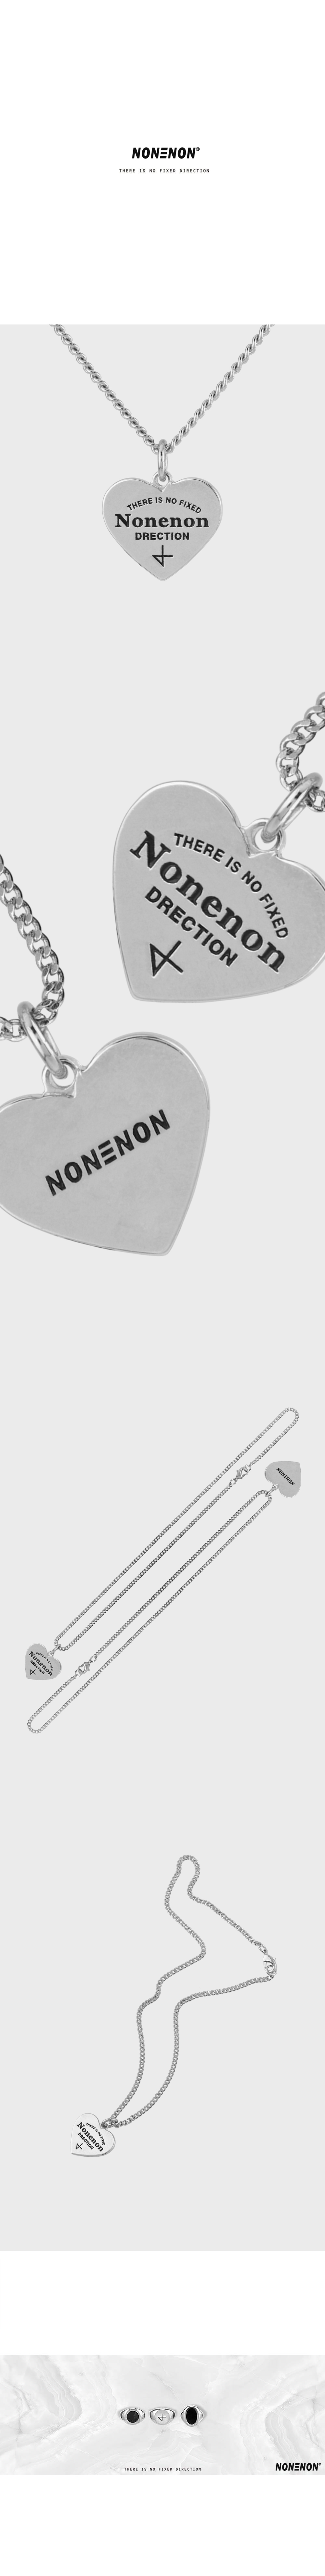 08 NEWLOGO LOVE NEC (5).jpg